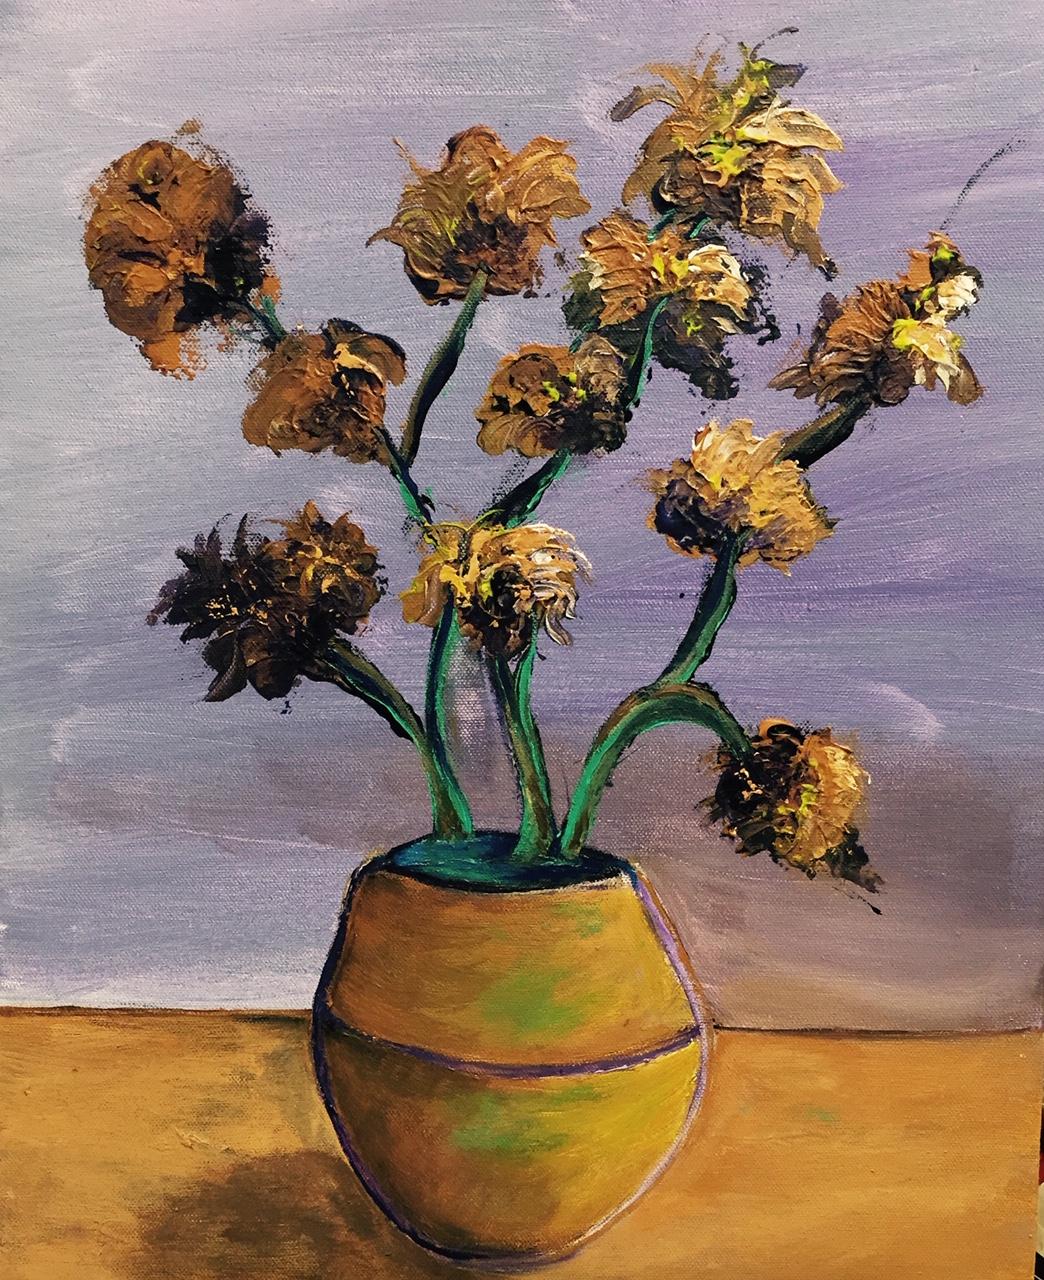 Golden Vase by Patrick Irish | ArtworkNetwork.com